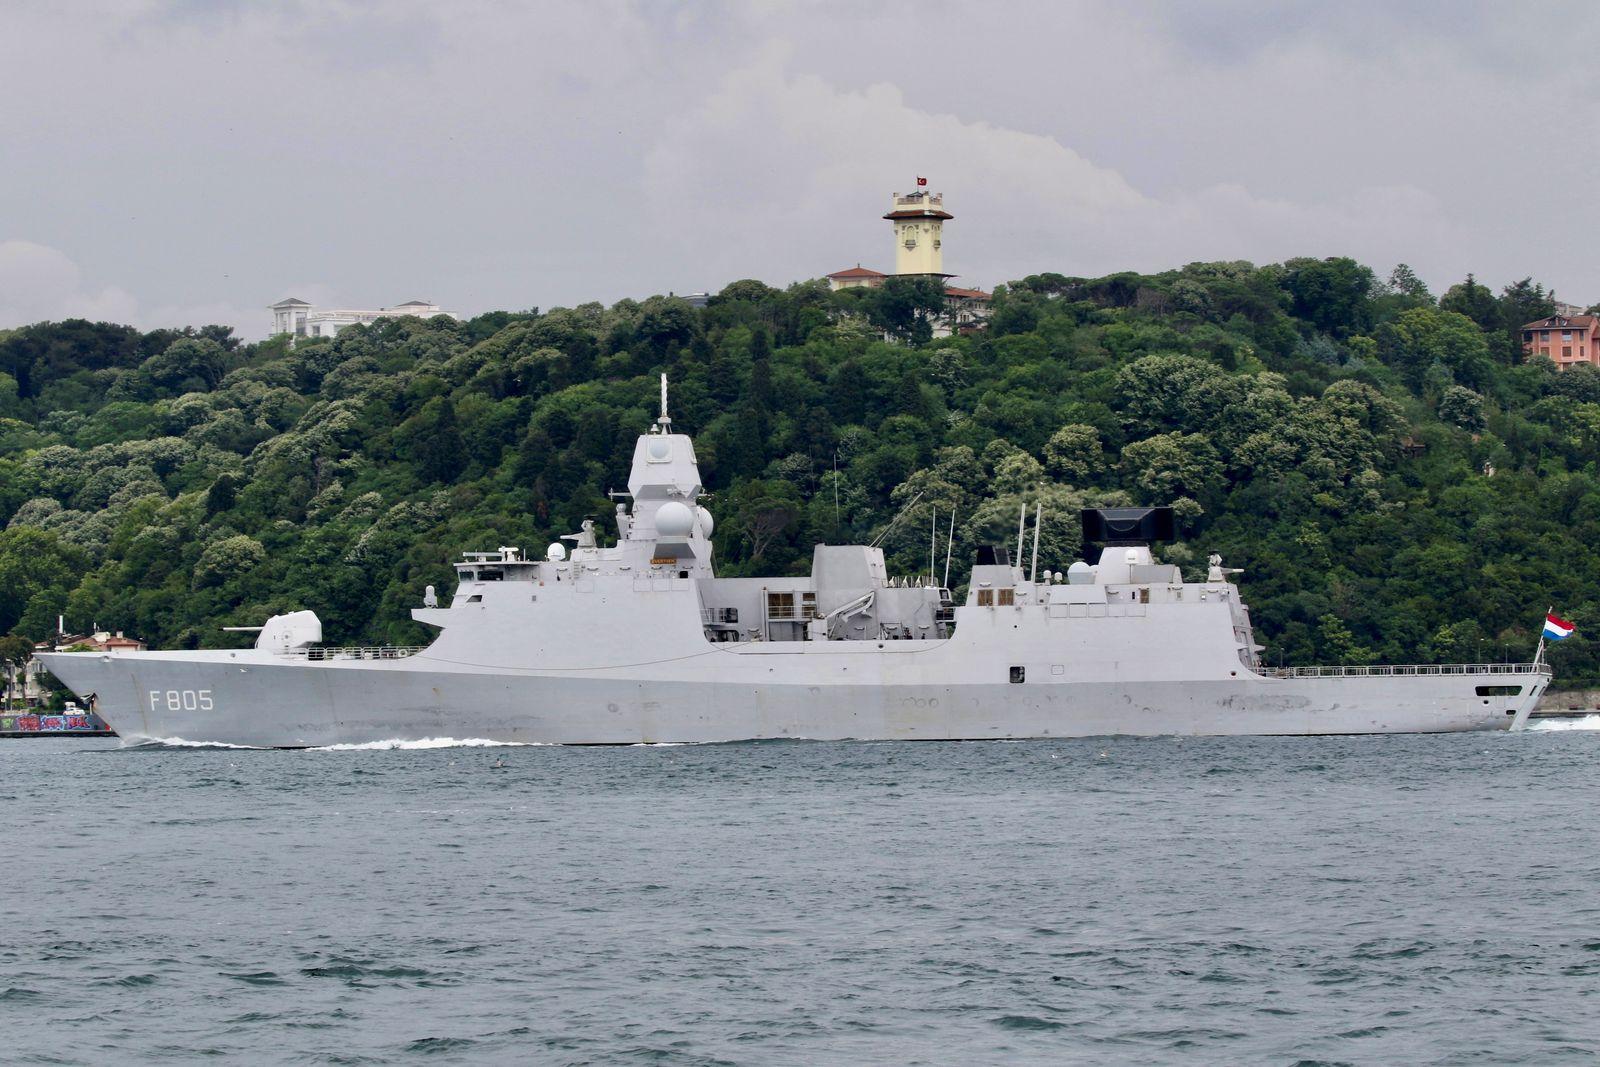 Royal Netherlands Navy frigate HNLMS Evertsen sets sail in Istanbul's Bosphorus